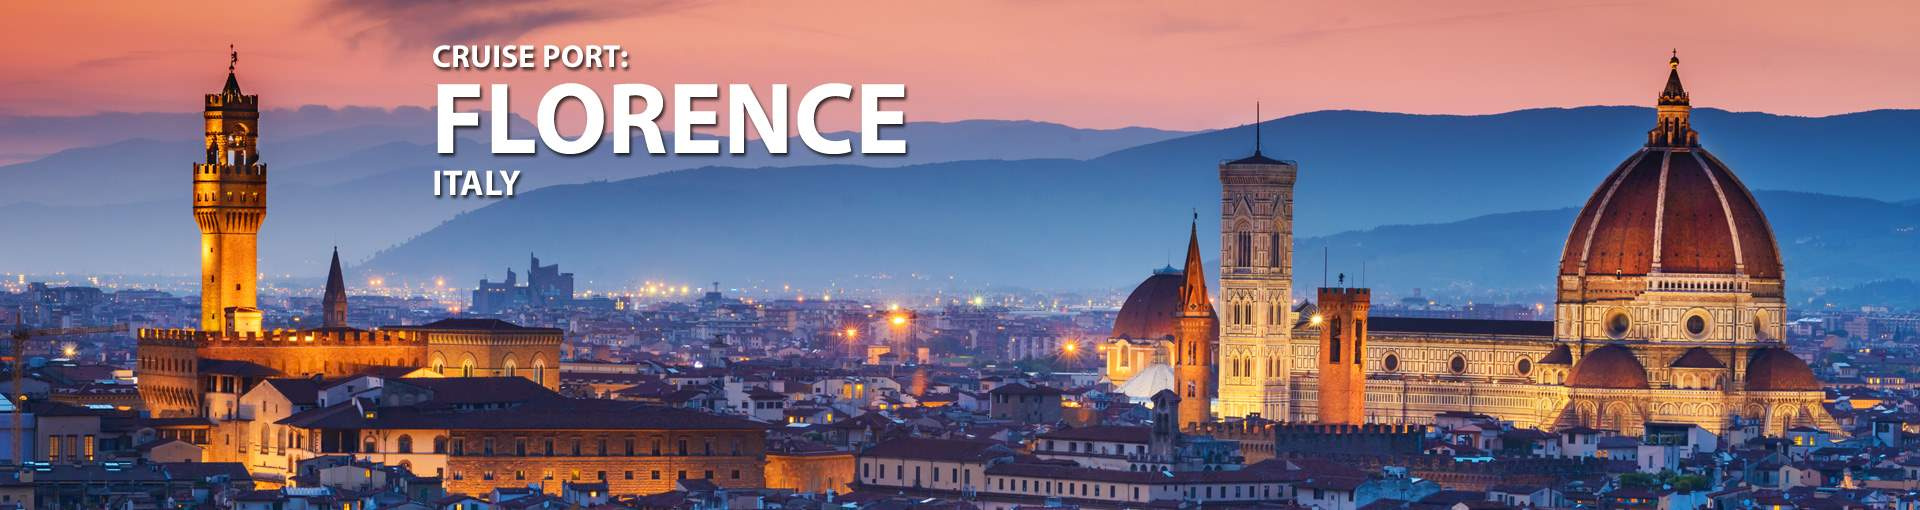 Florence Italy Cruise Port And Cruises To Florence - Italy cruises